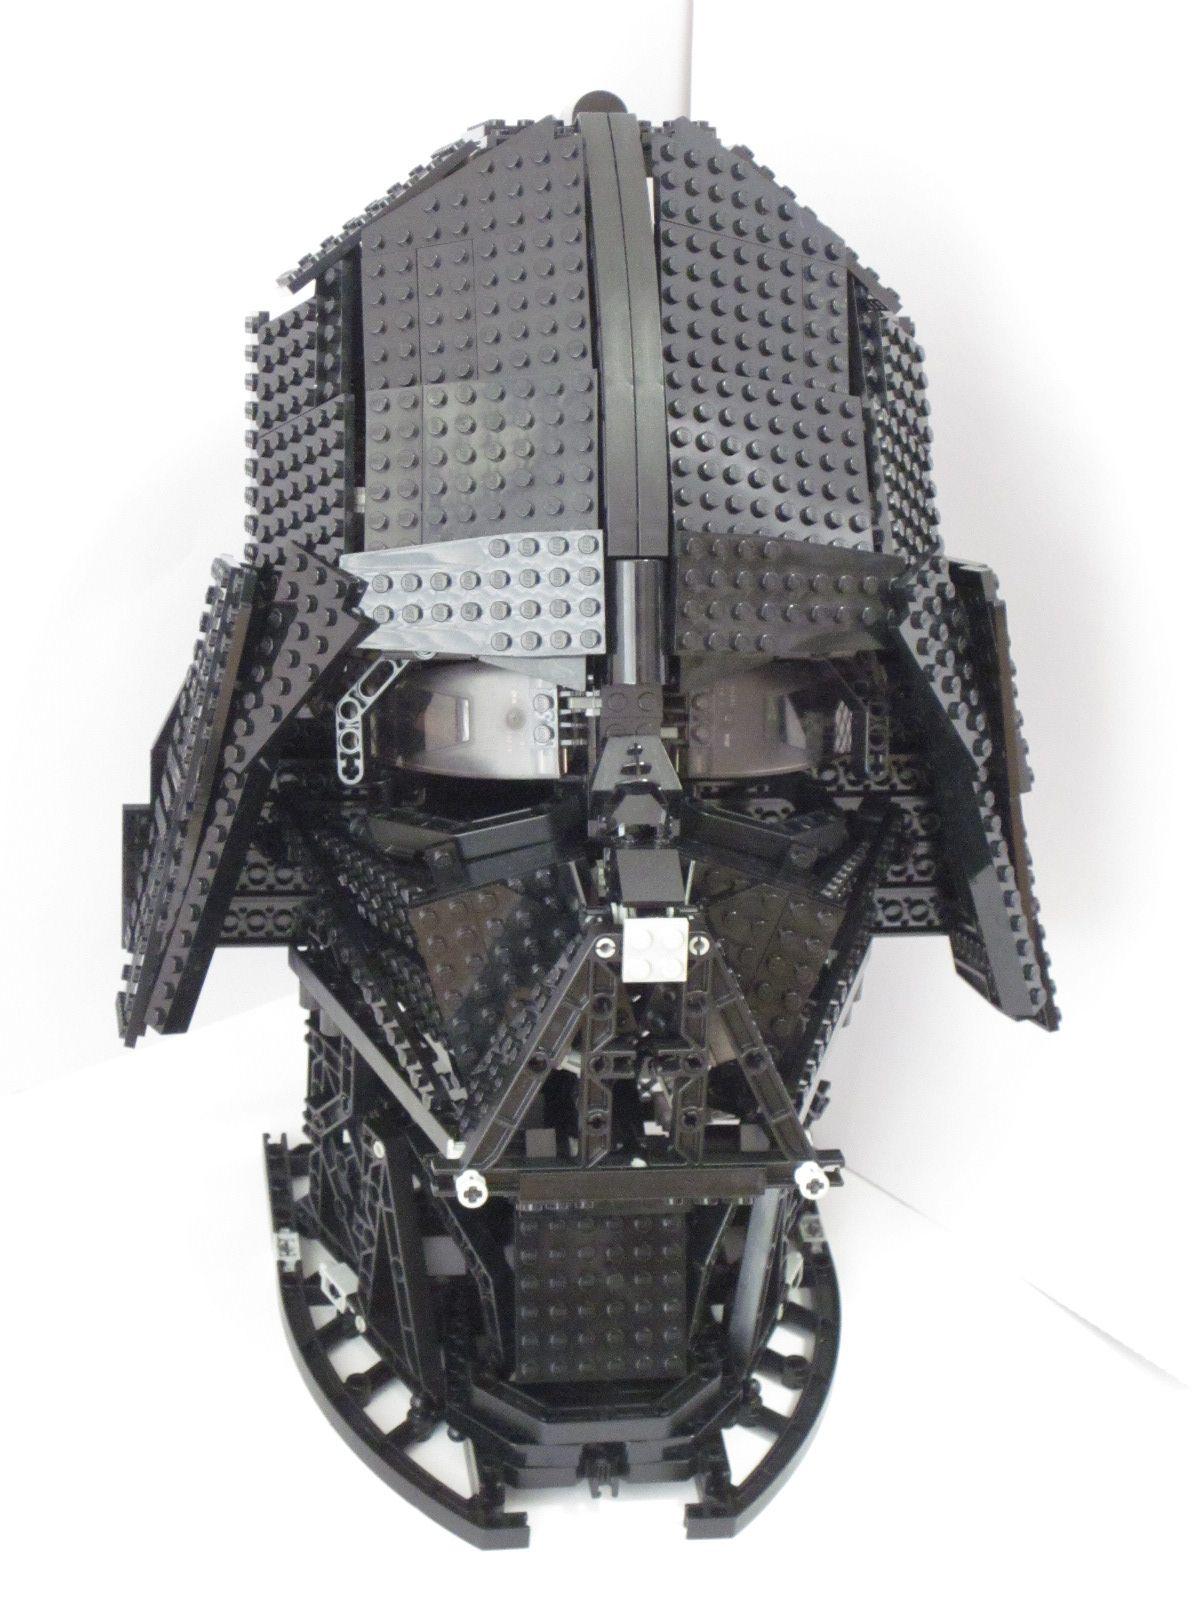 Darth Vader helmet (by Nb-Koh) #LEGO #StarWars